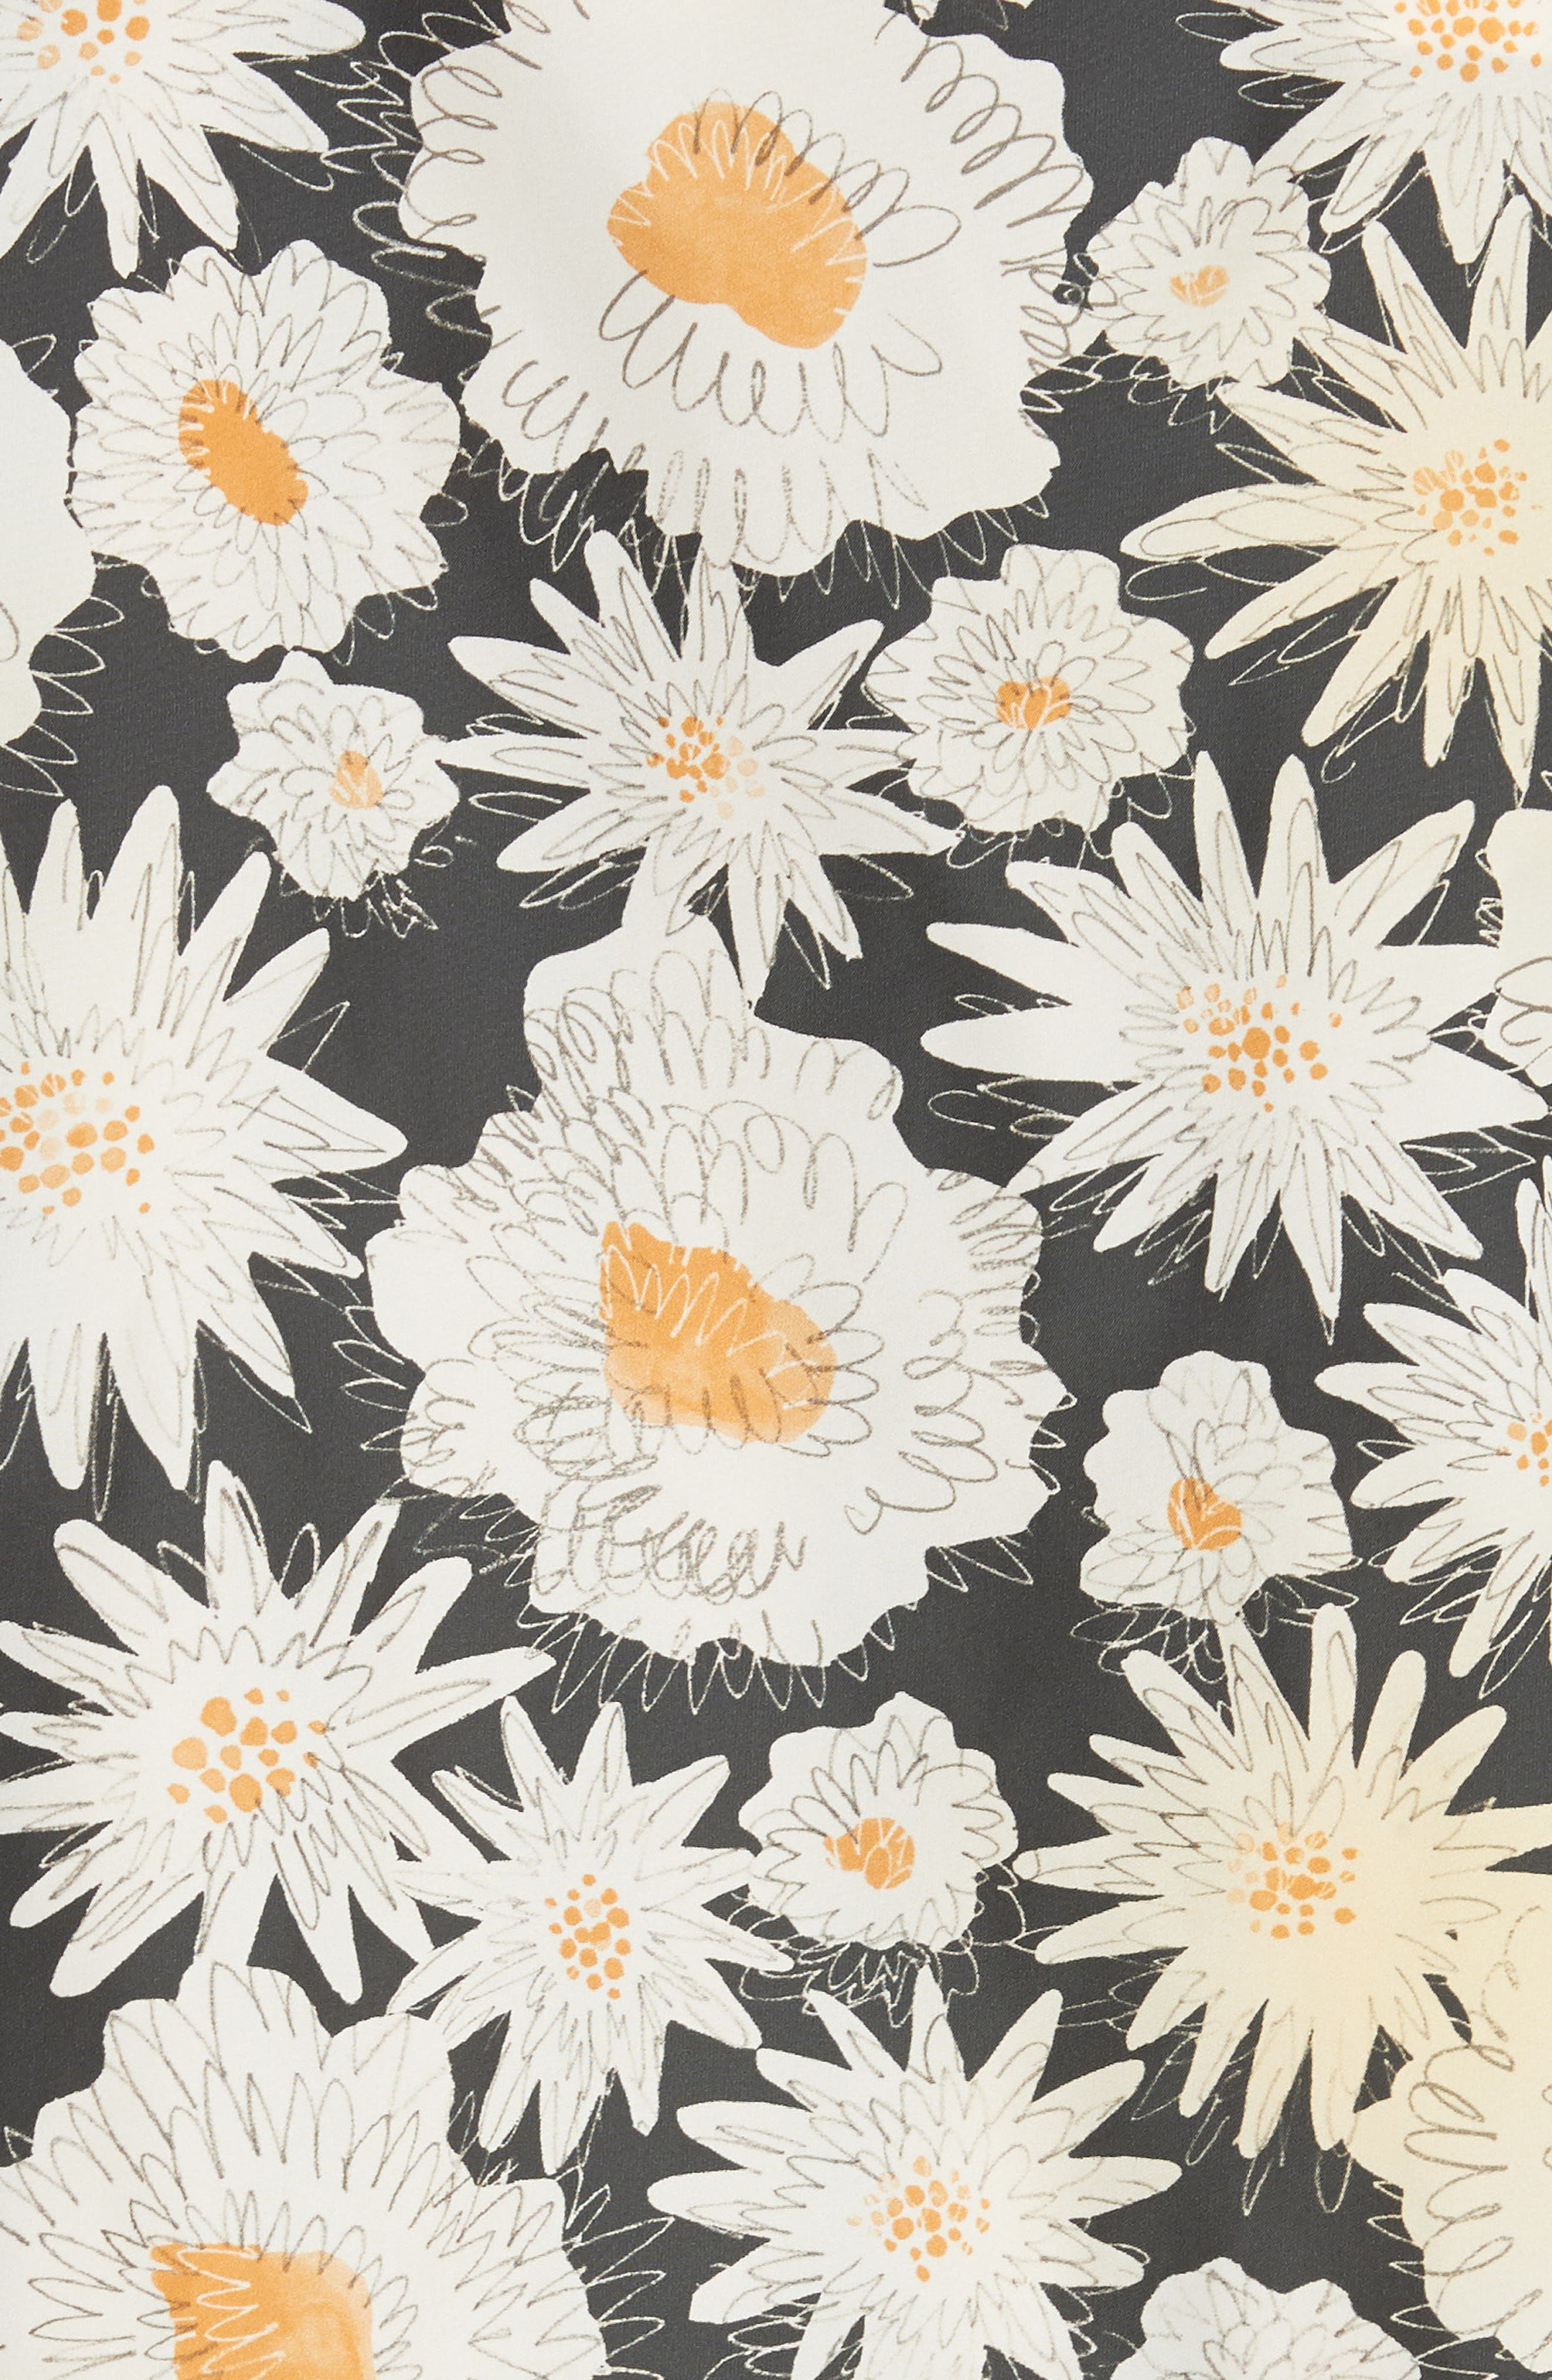 Fullerton Floral Print Windbreaker,                             Alternate thumbnail 5, color,                             Black